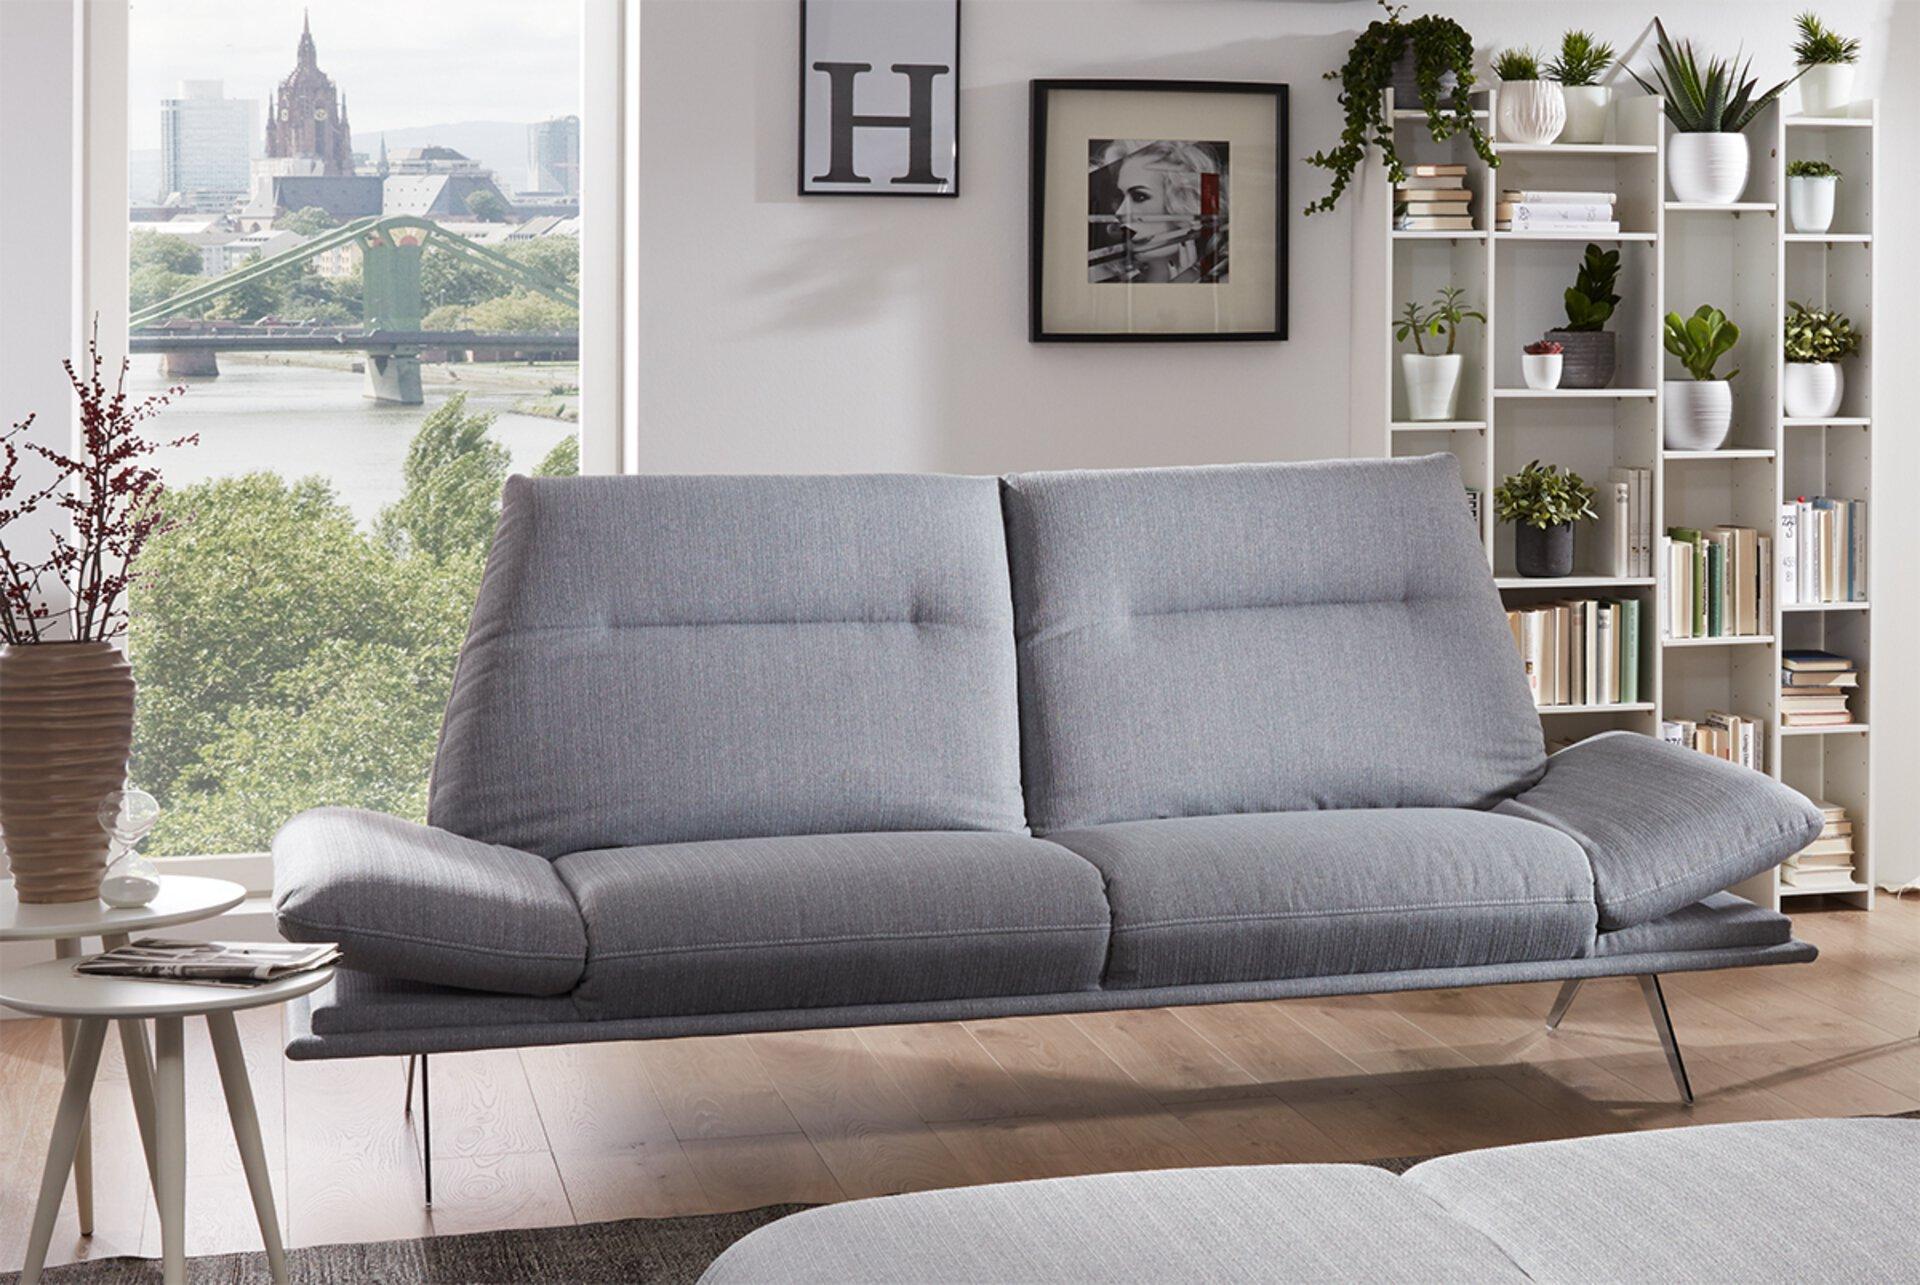 Sofa 2-Sitzer VONOS Vito Textil 99 x 231 cm